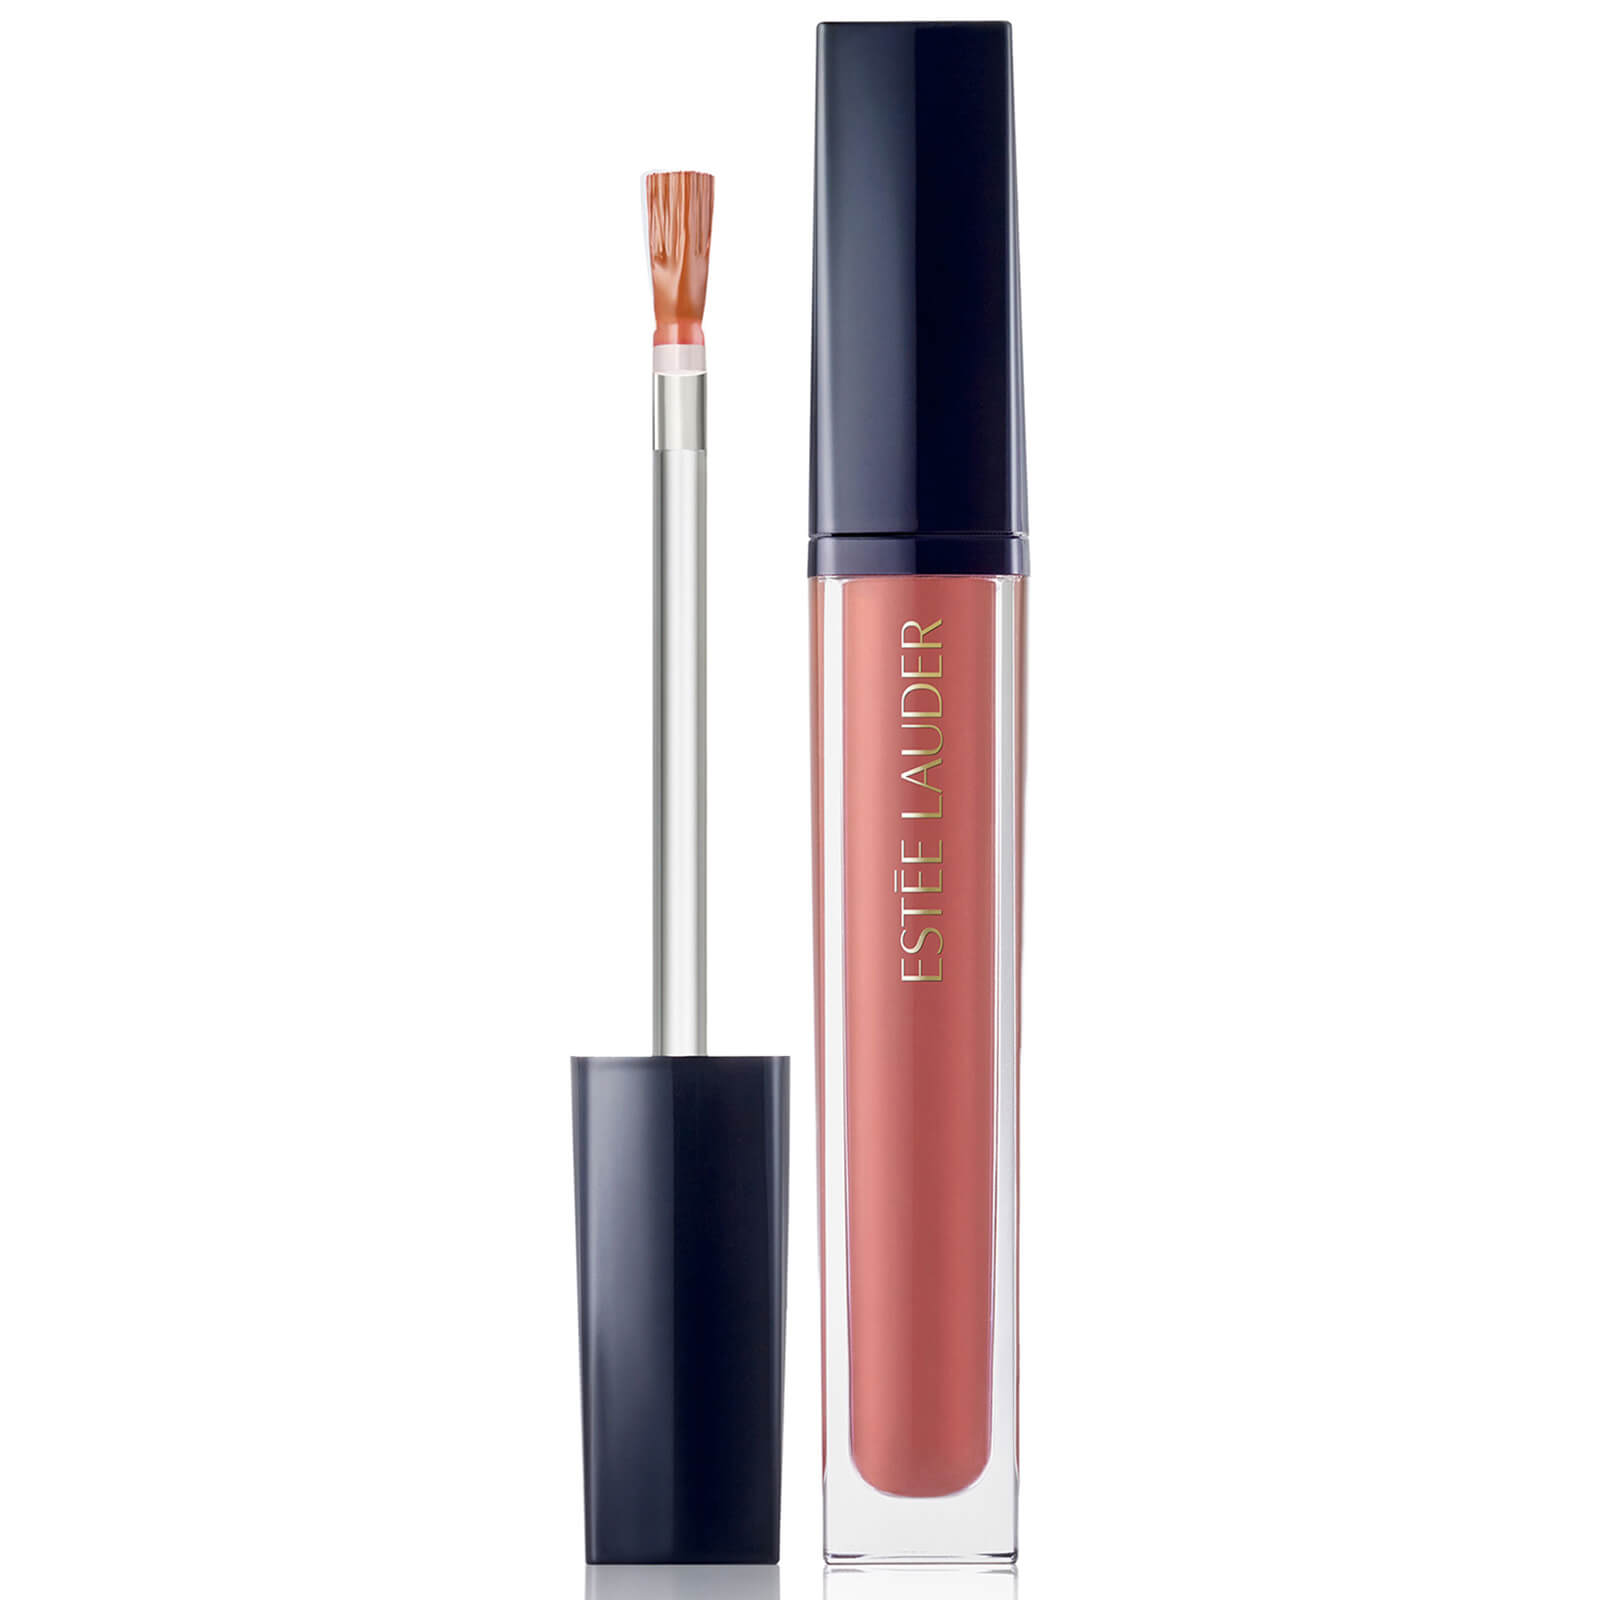 Estée Lauder Pure Color Envy Kissable Lip Shine 5.8ml (Various Shades) - Naked Truth